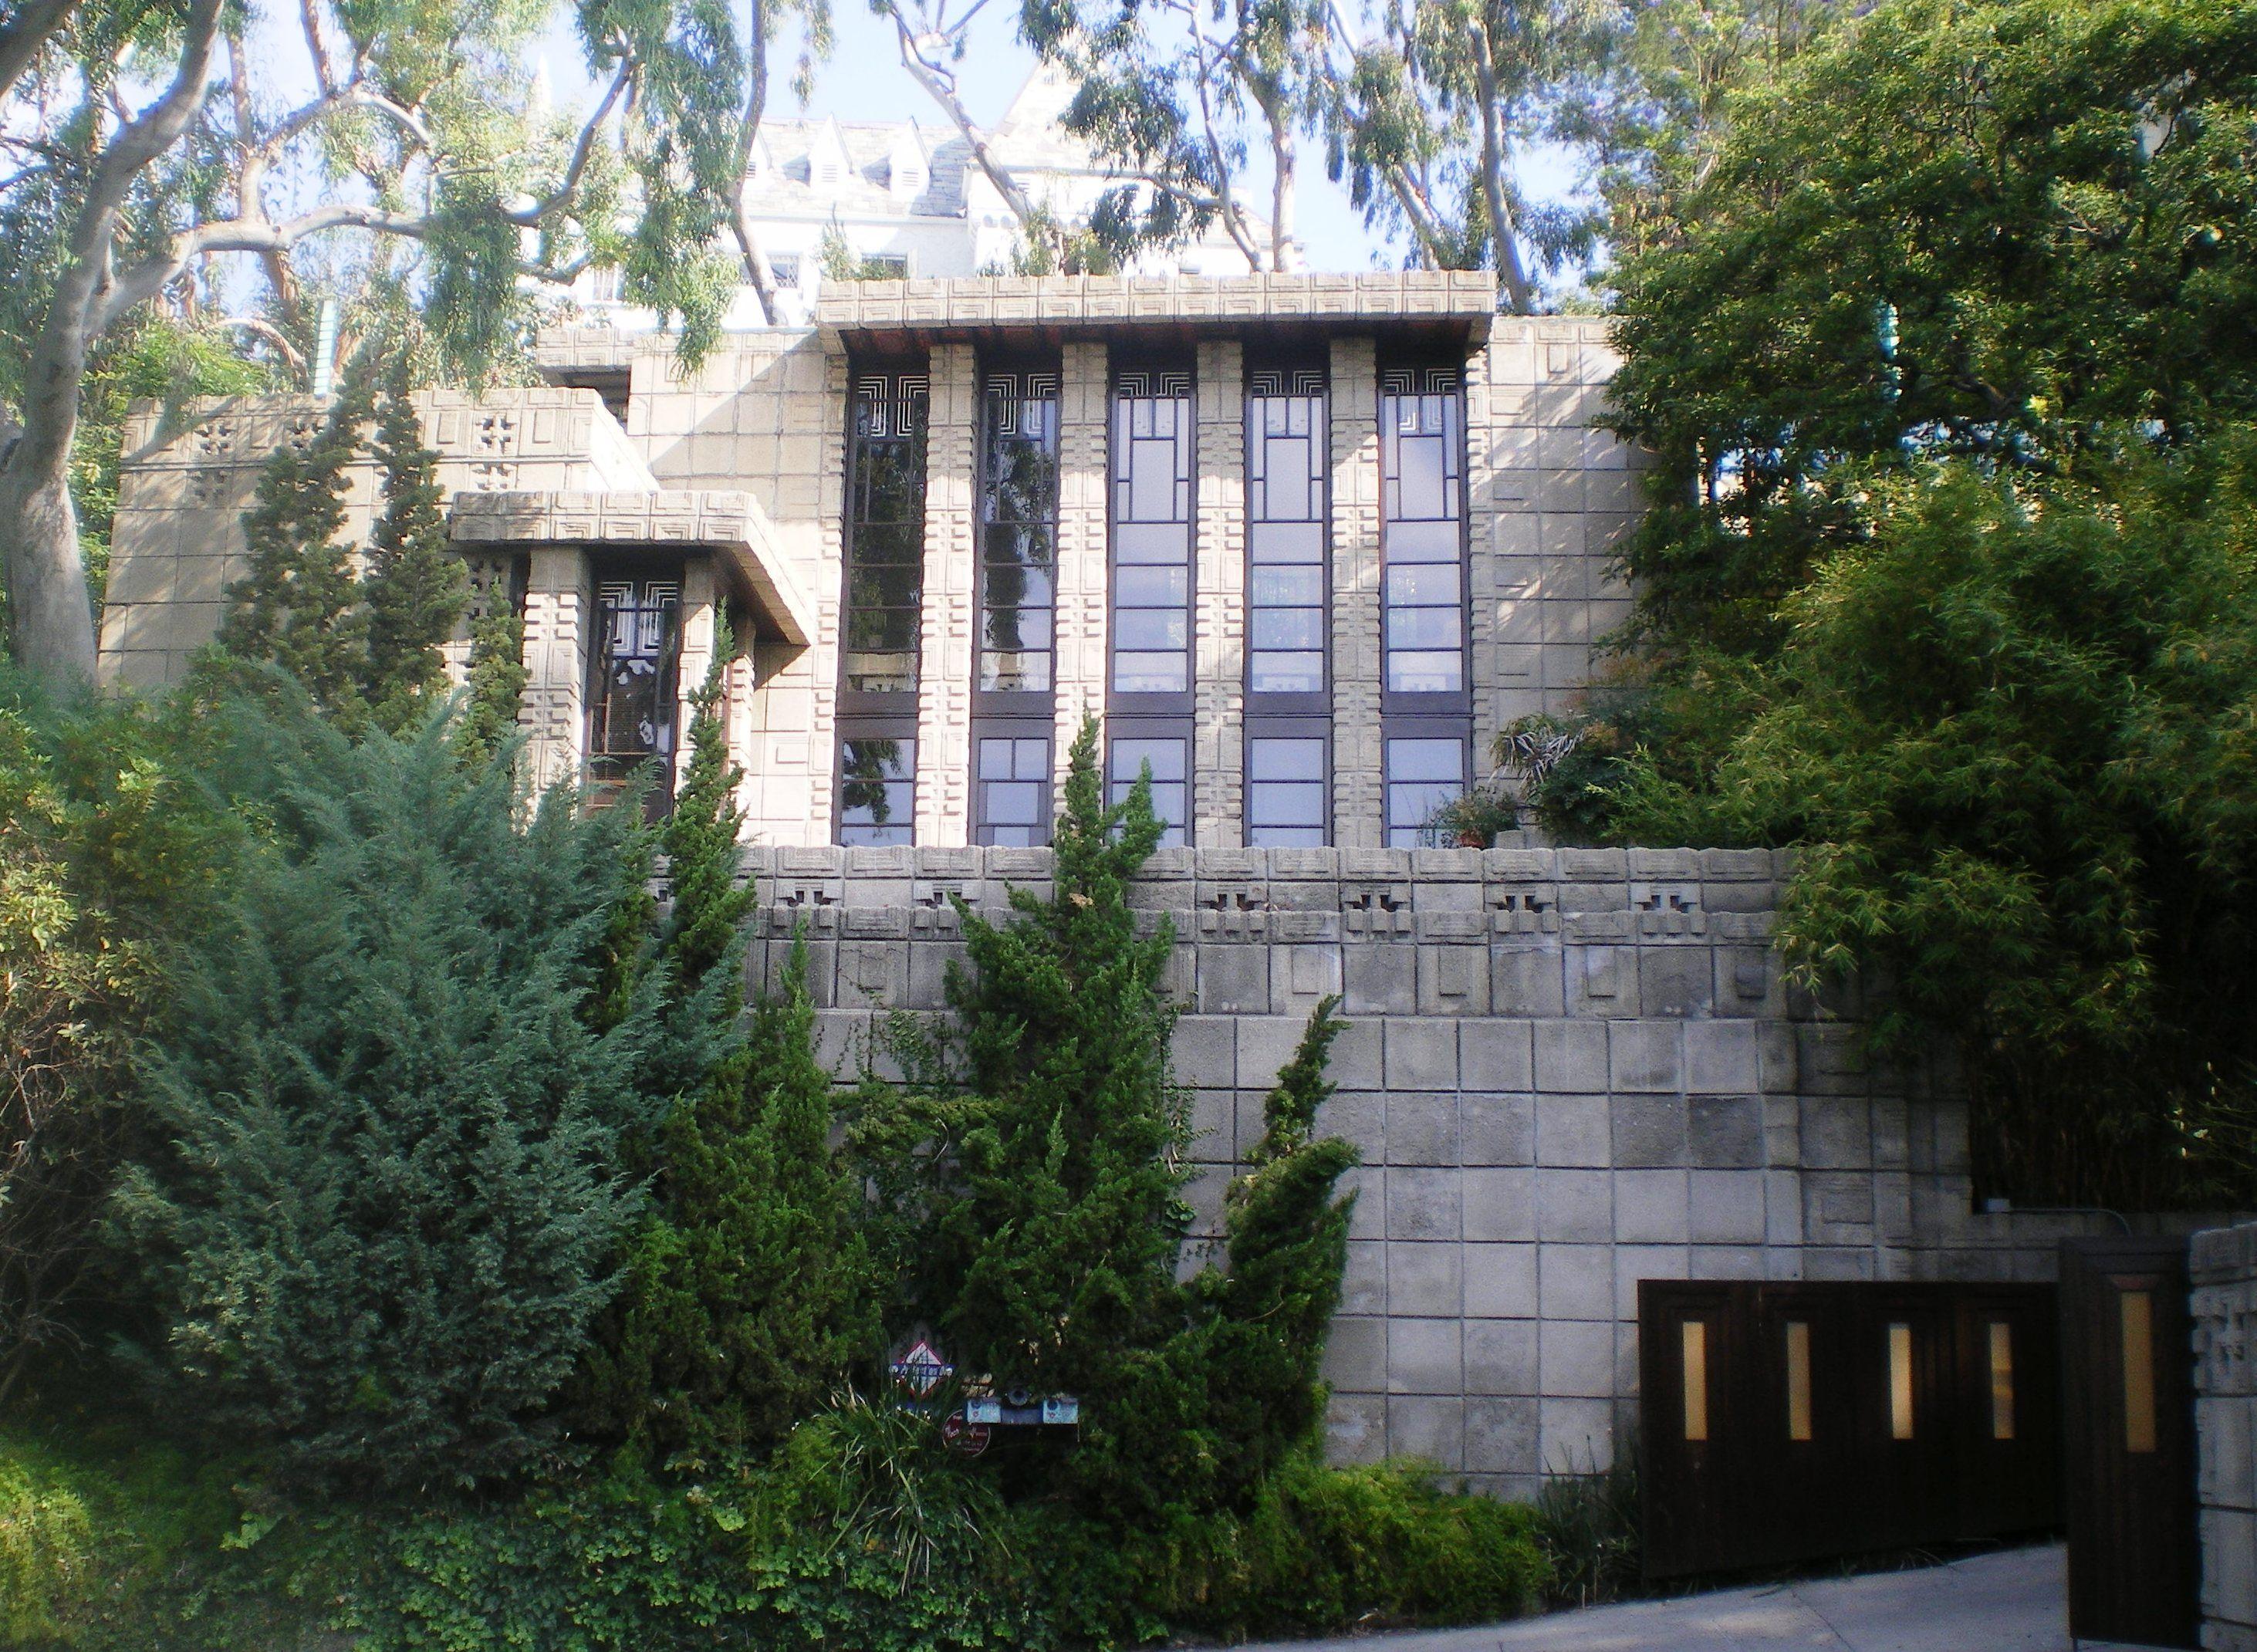 Storer House 1923 Frank Lloyd Wright 8161 Hollywood Blvd Los Angeles California